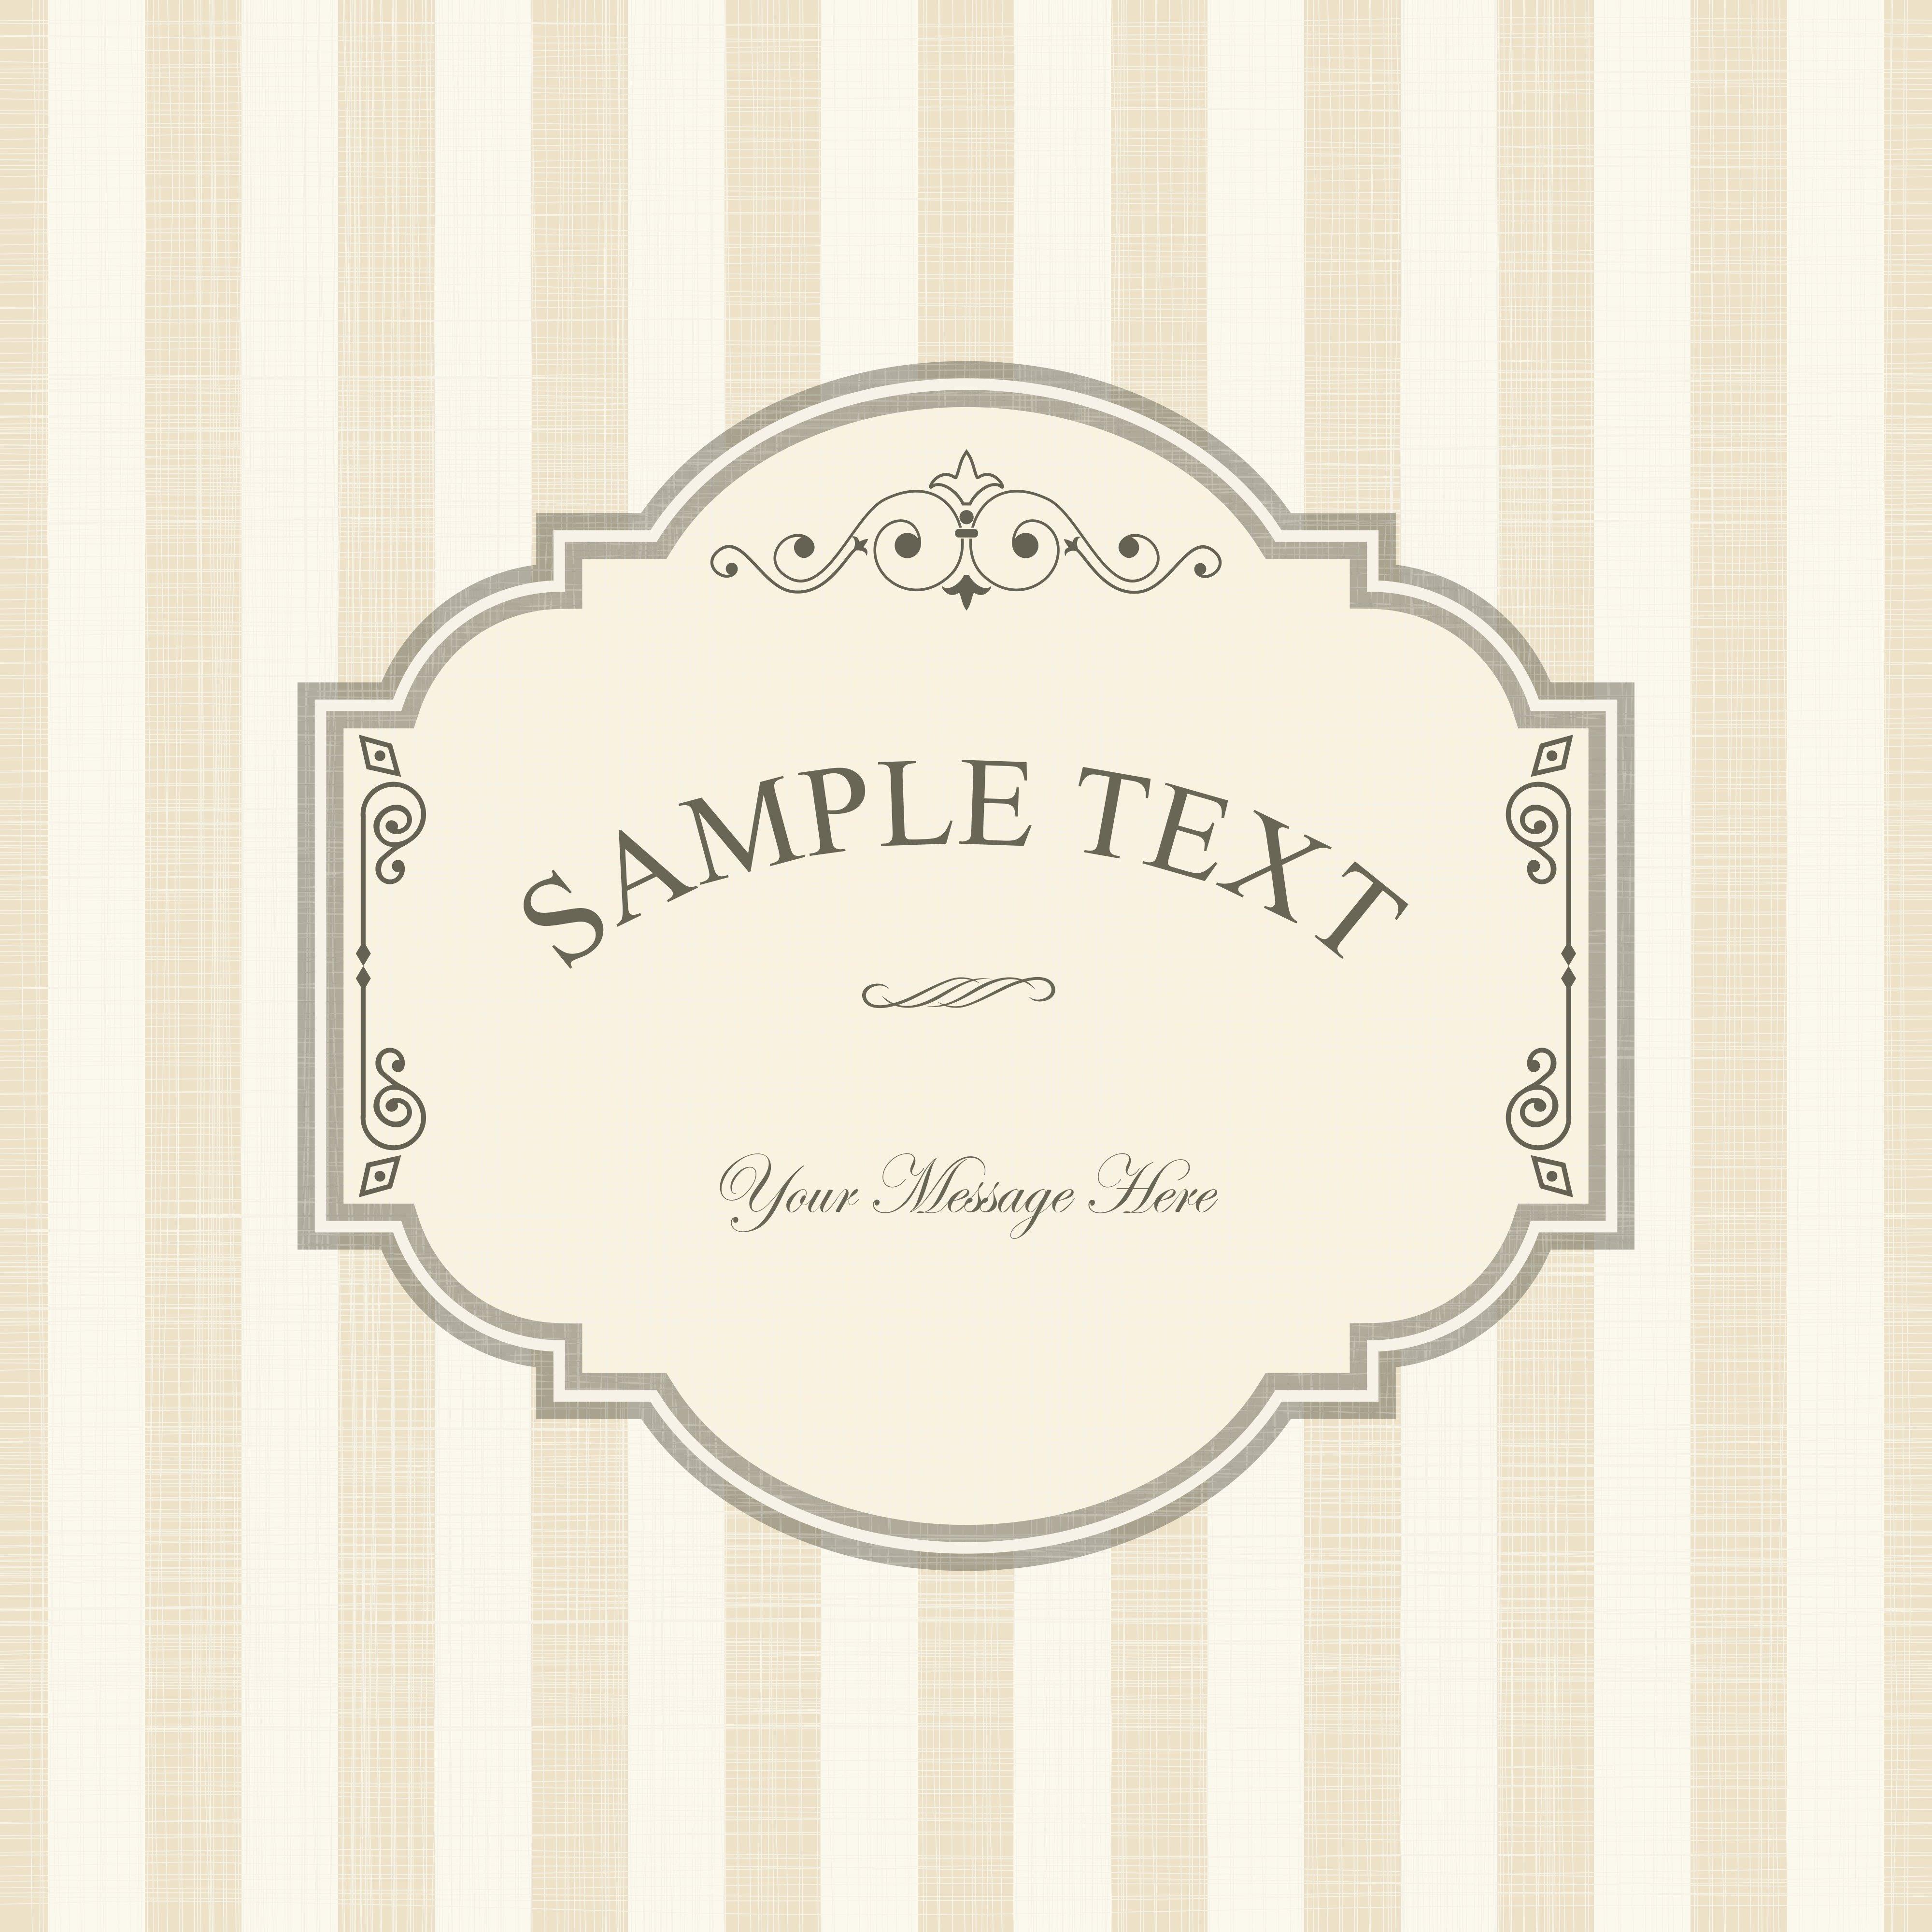 Fake Prescription Label Generator New Wedding Label Templates – Emmamcintyrephotography